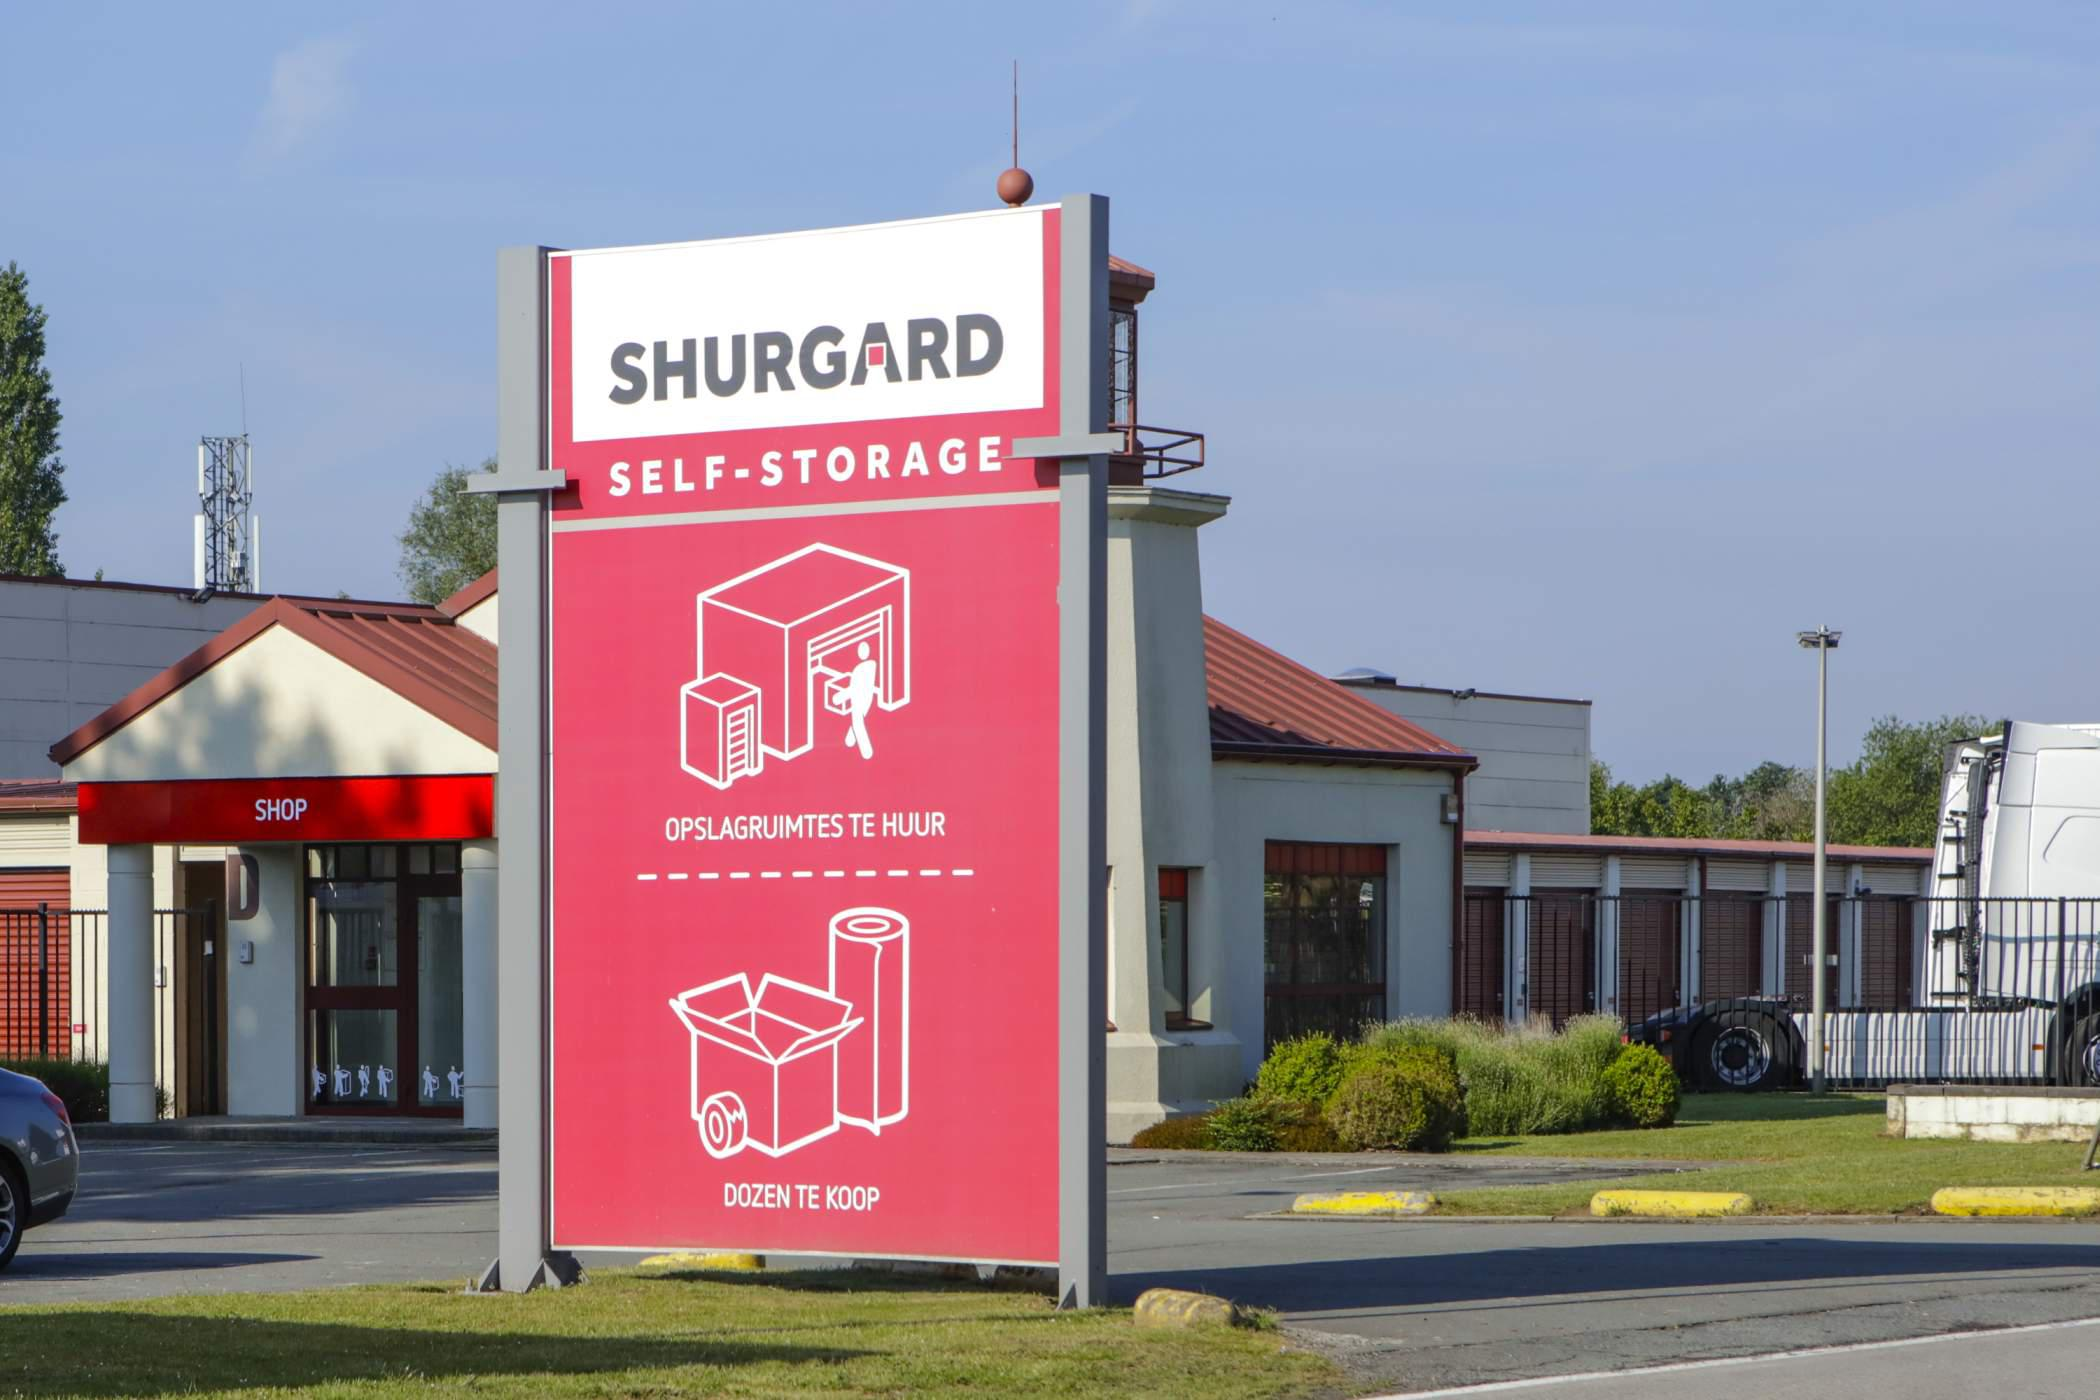 Shurgard Self-Storage Zaventem